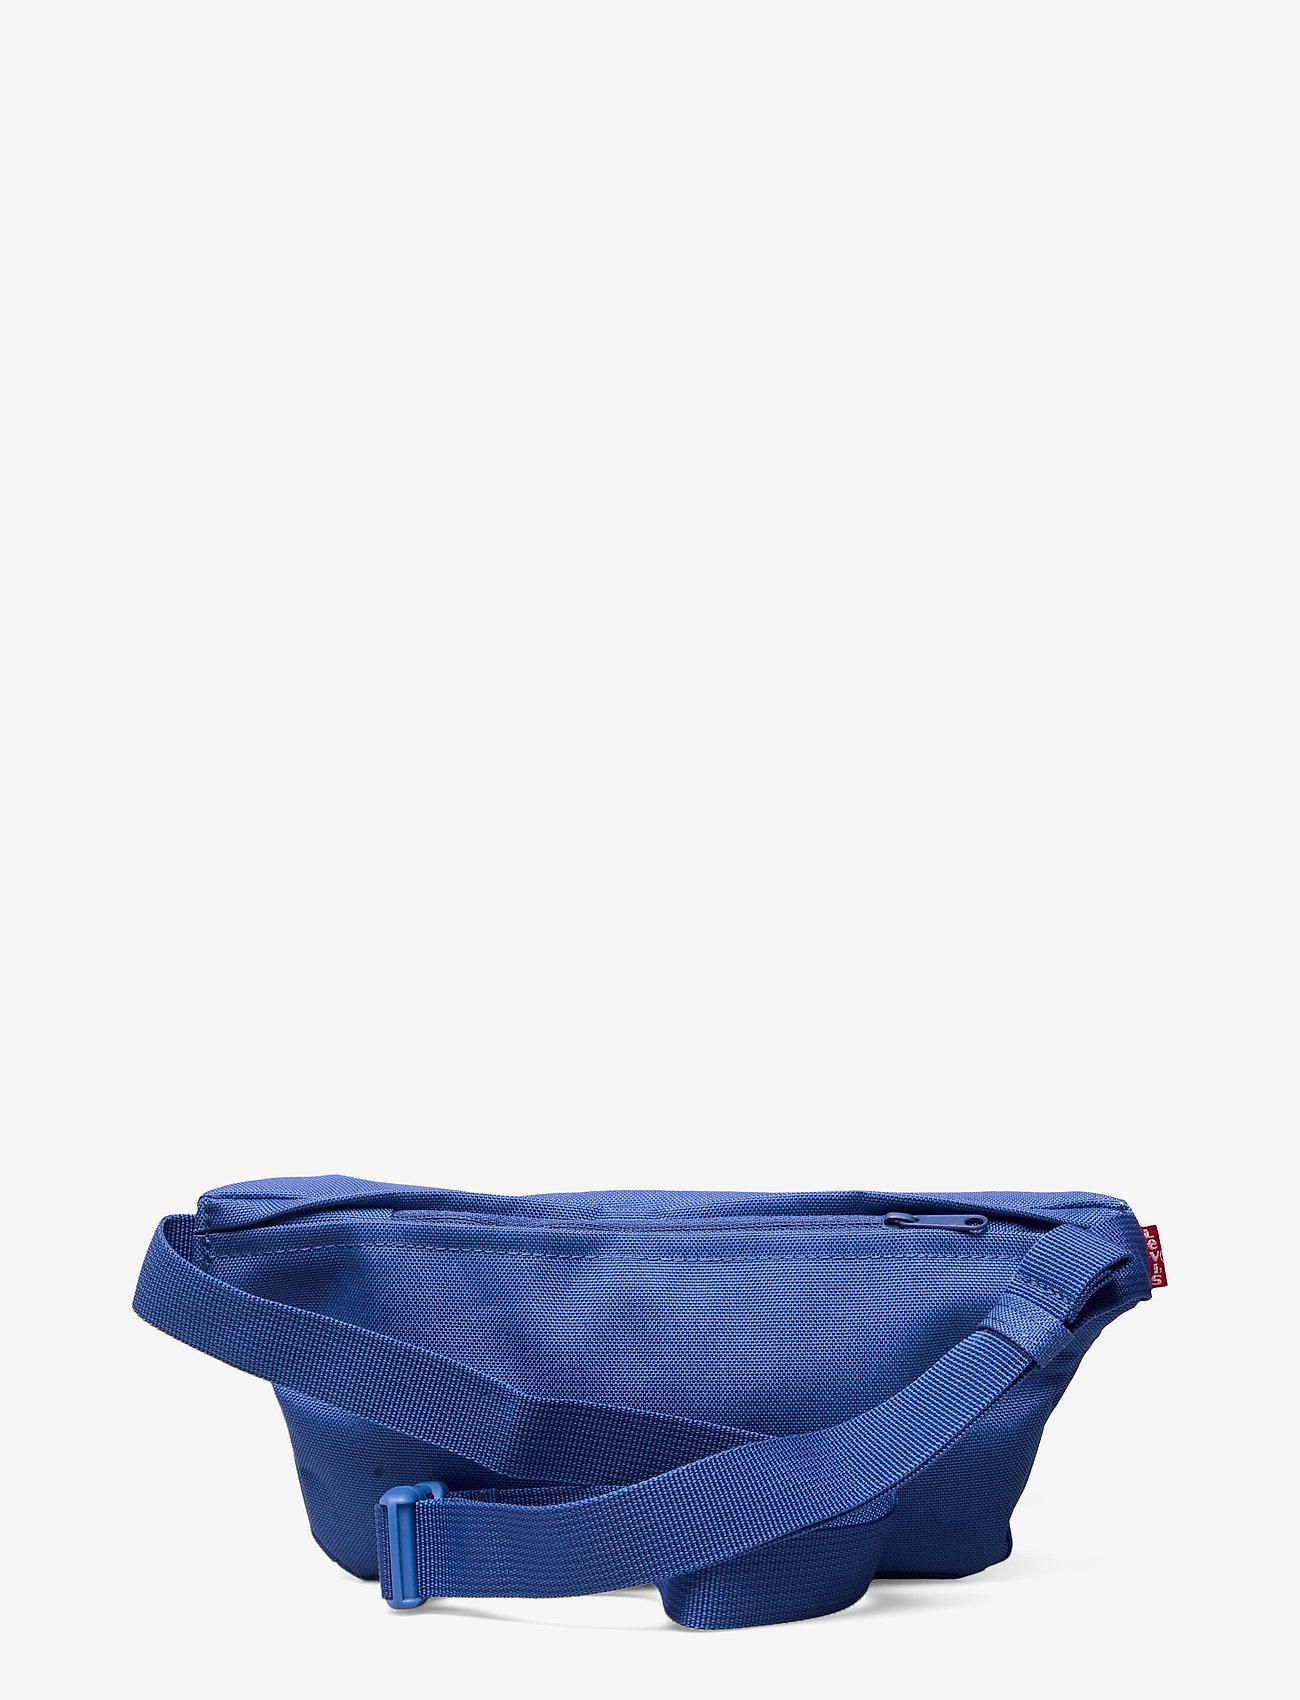 Levi's Footwear & Acc - Small Banana Sling - Vintage Modern Logo - sacs banane - jeans blue - 1